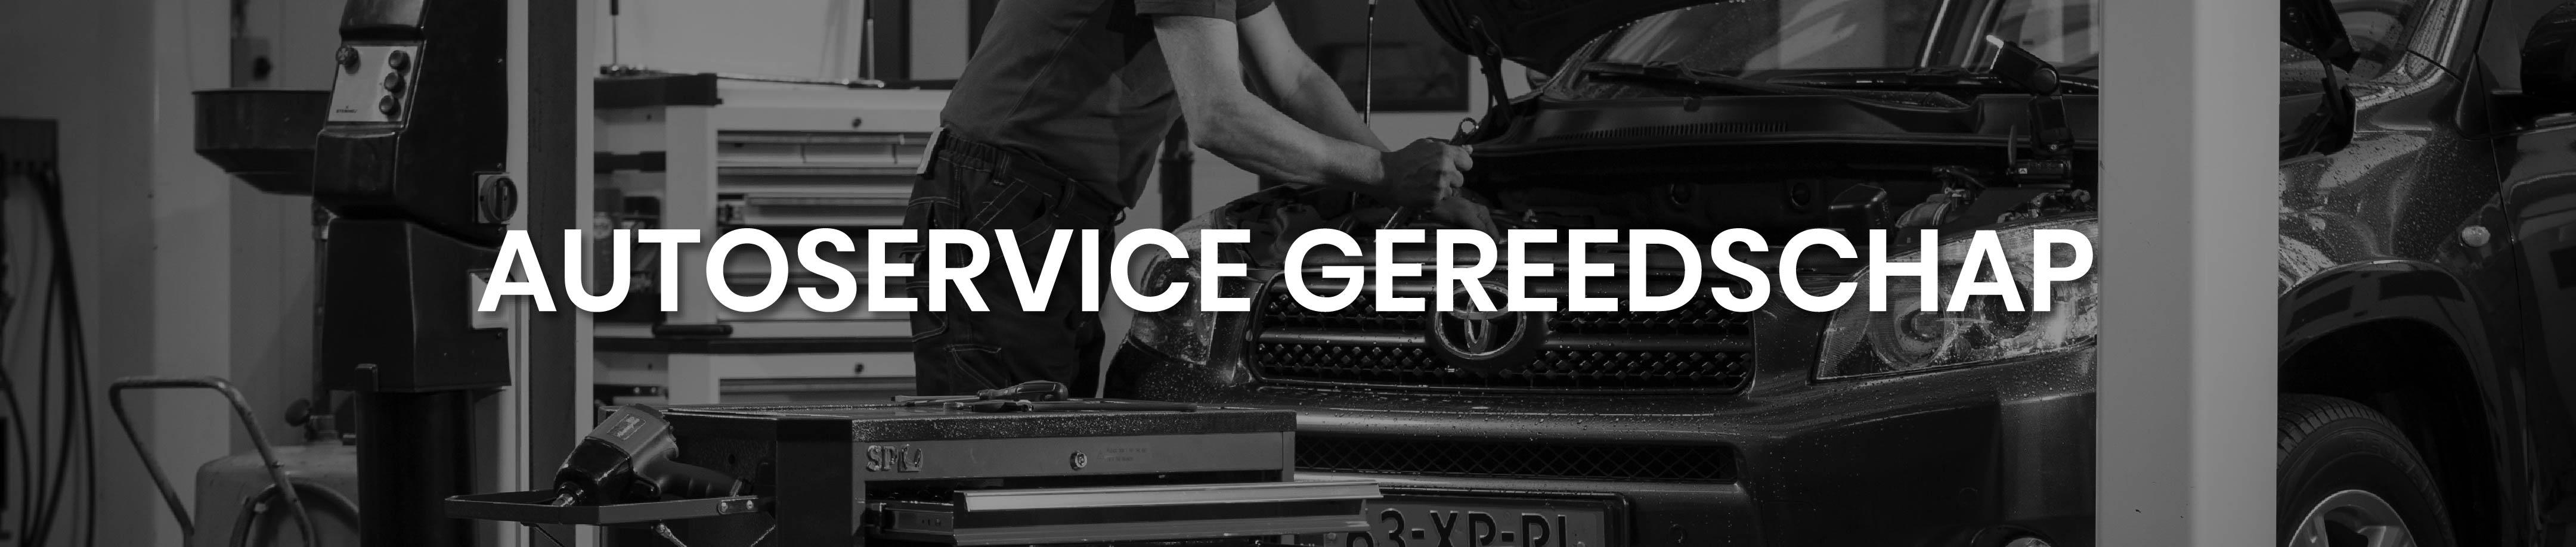 Autoservice gereedschap